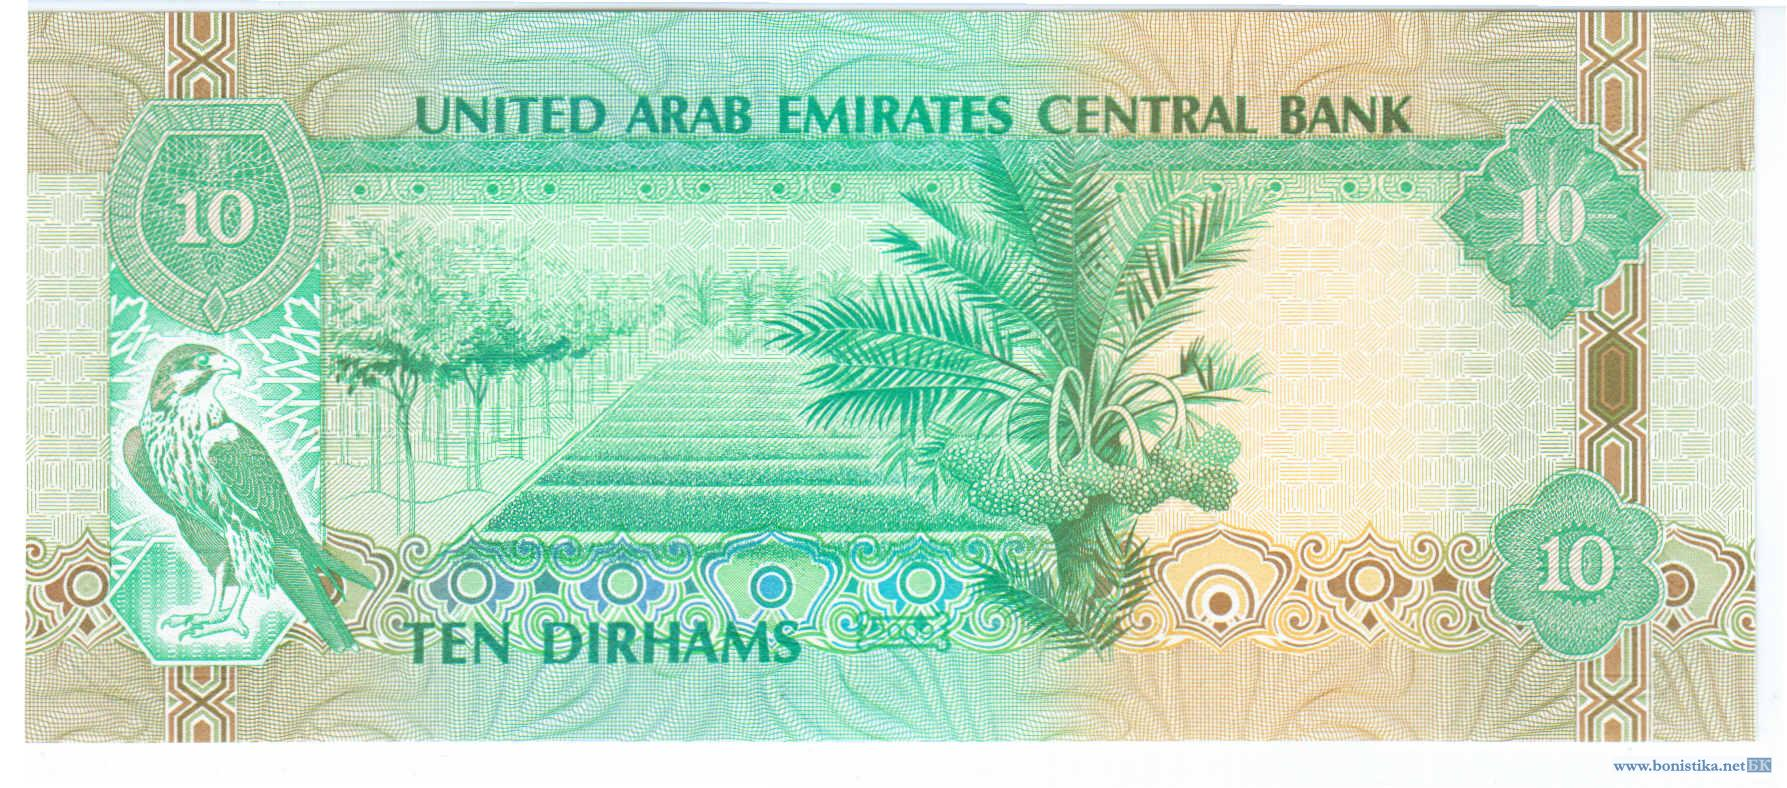 Какая валюта в эмиратах